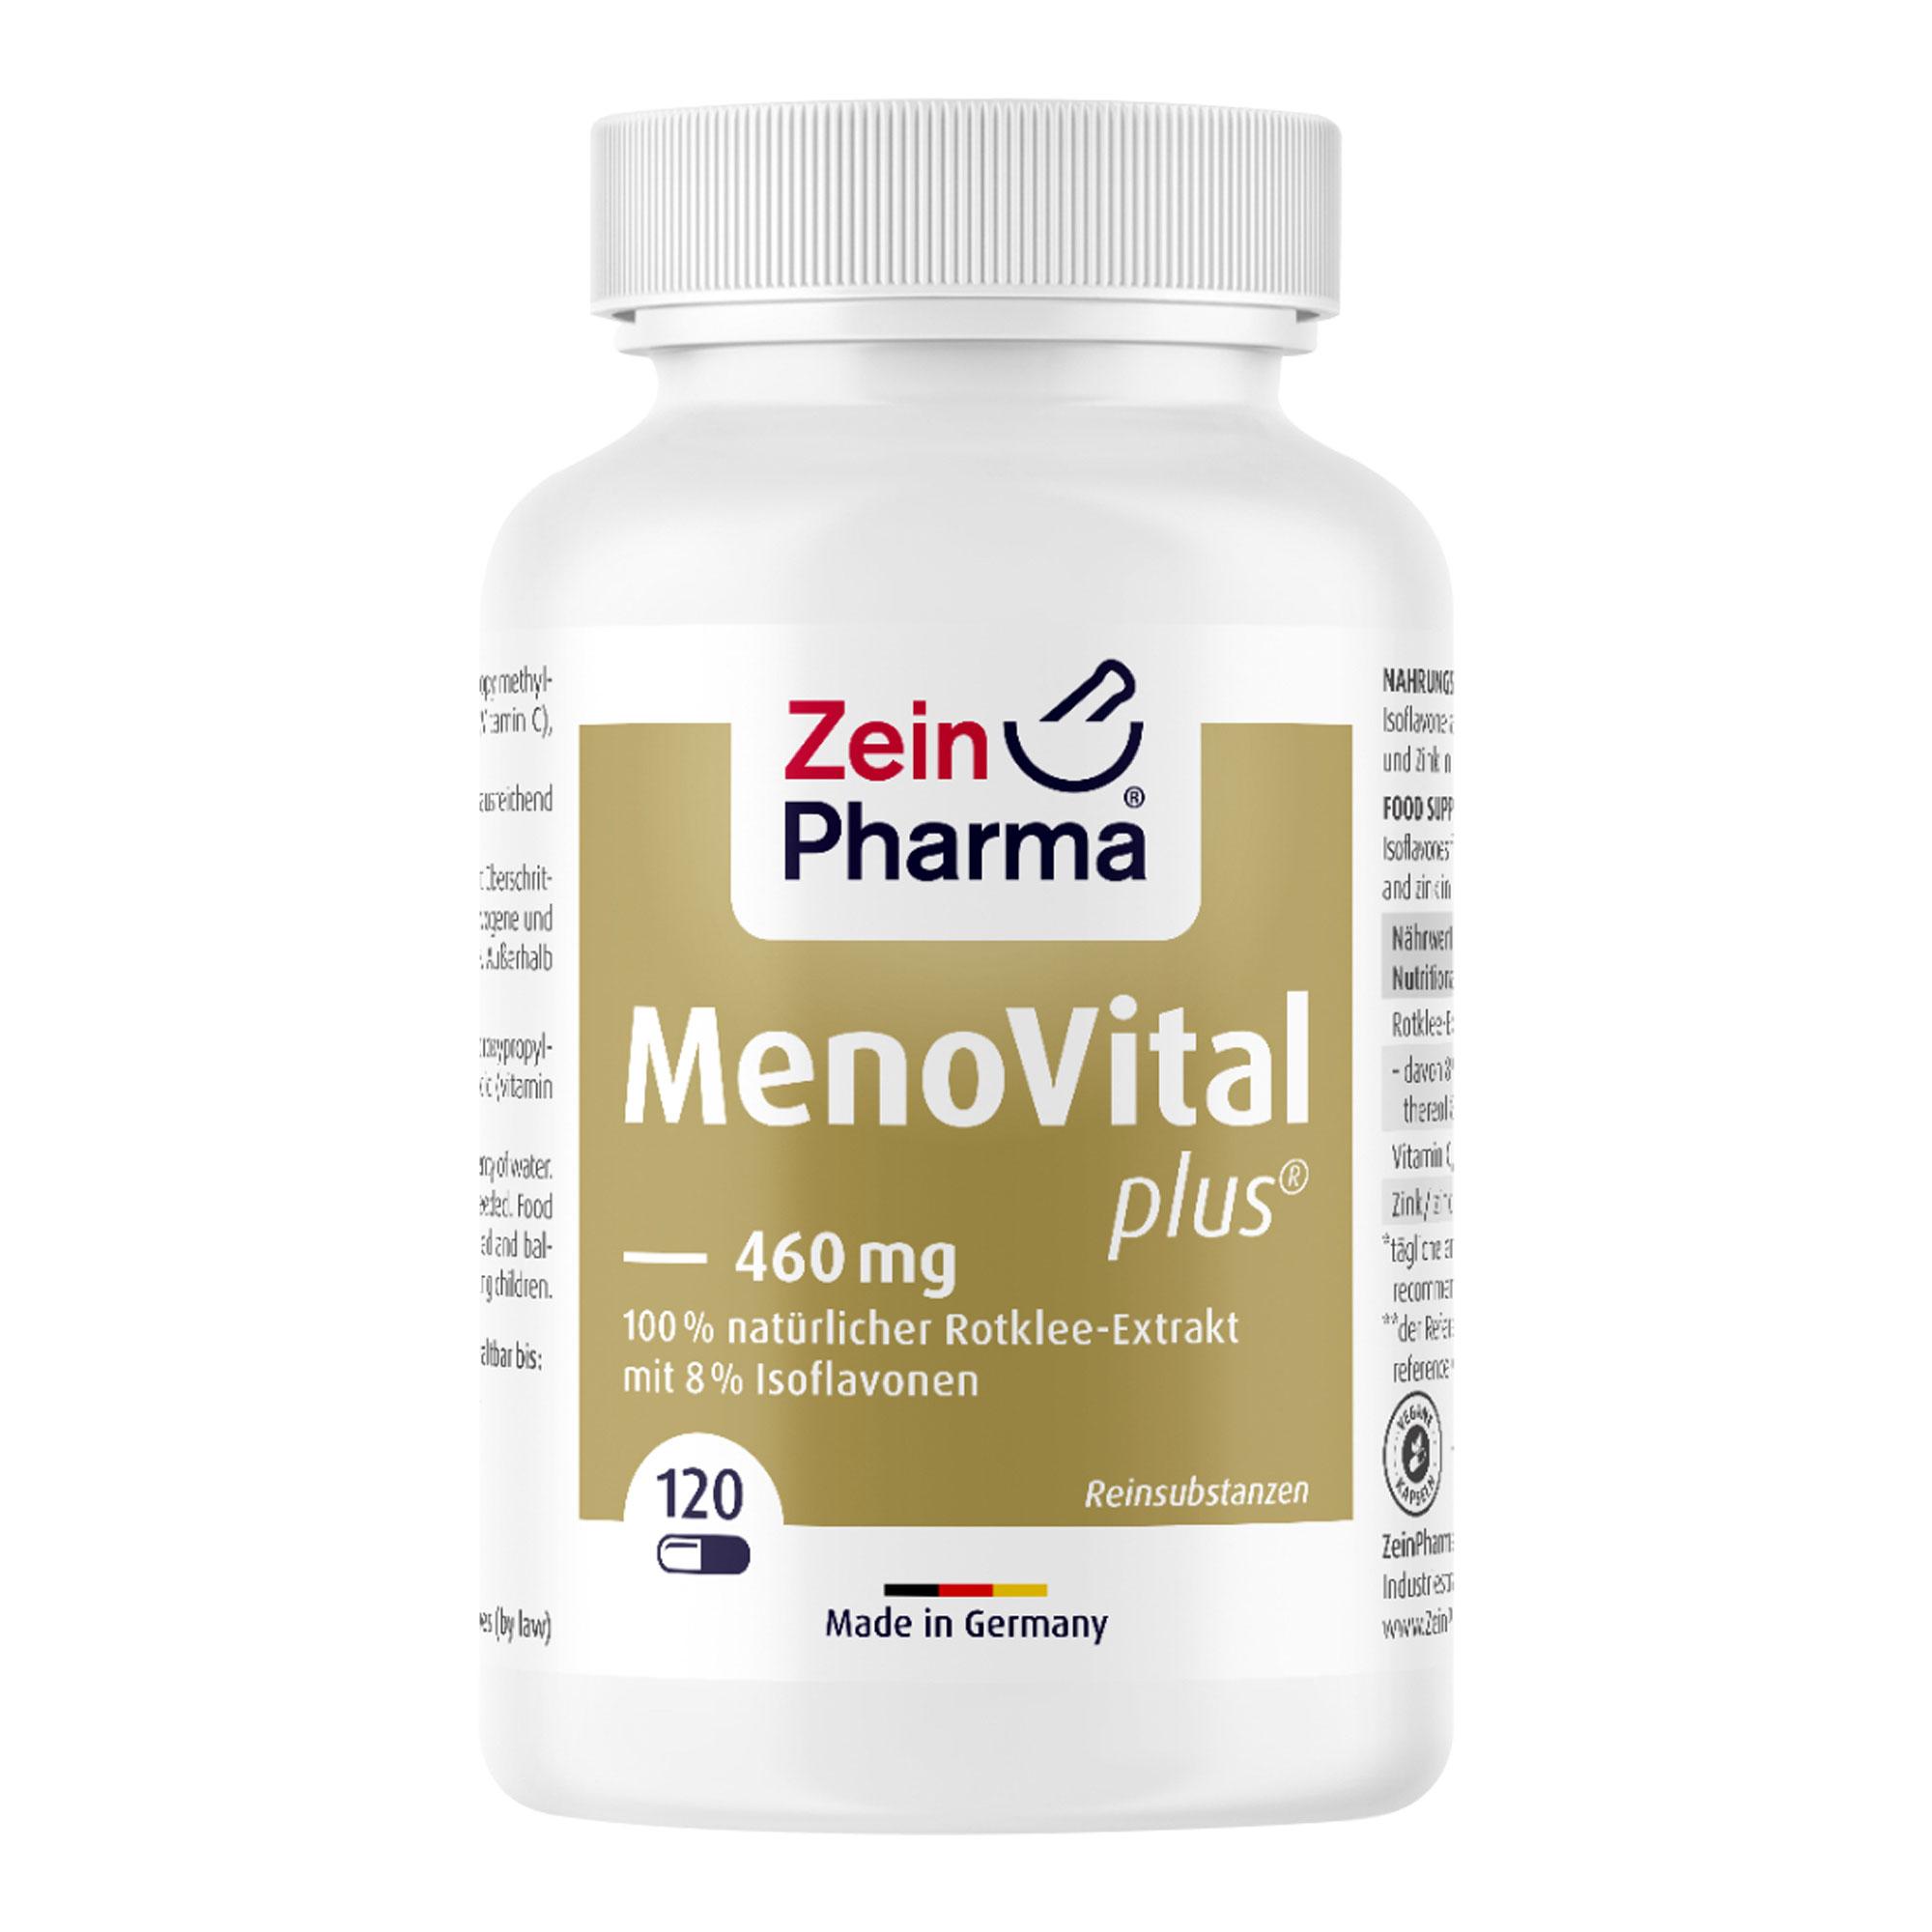 MenoVital Plus 460 mg